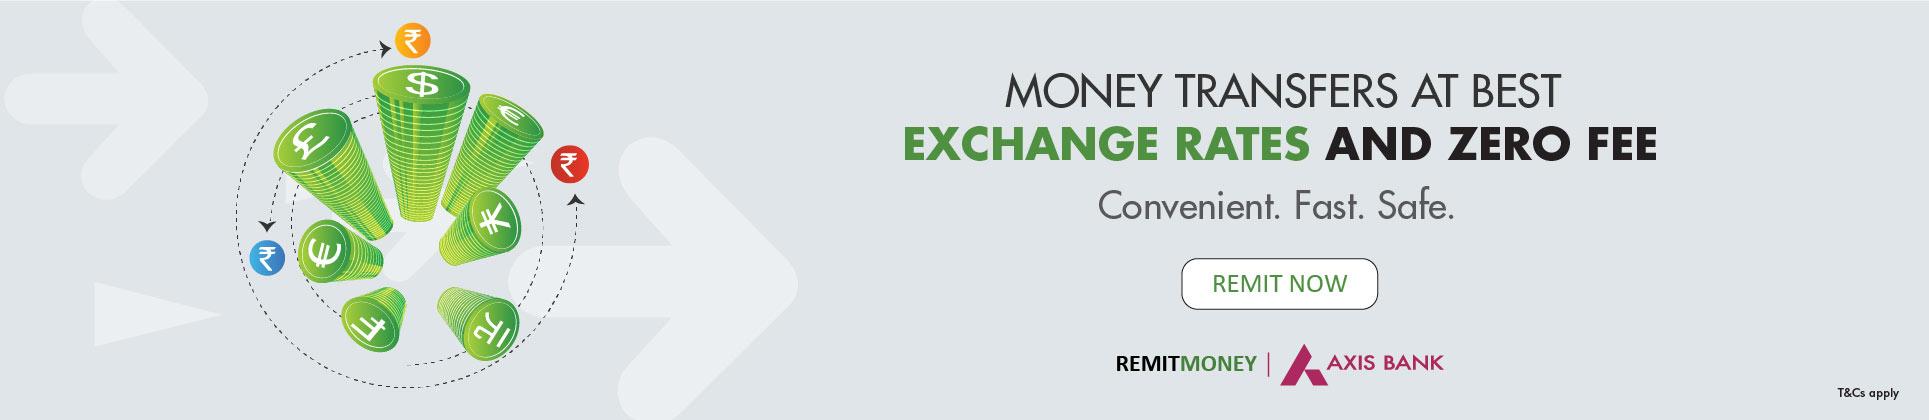 RemitMoney-1920x420-pixels-New-Homepage-banner